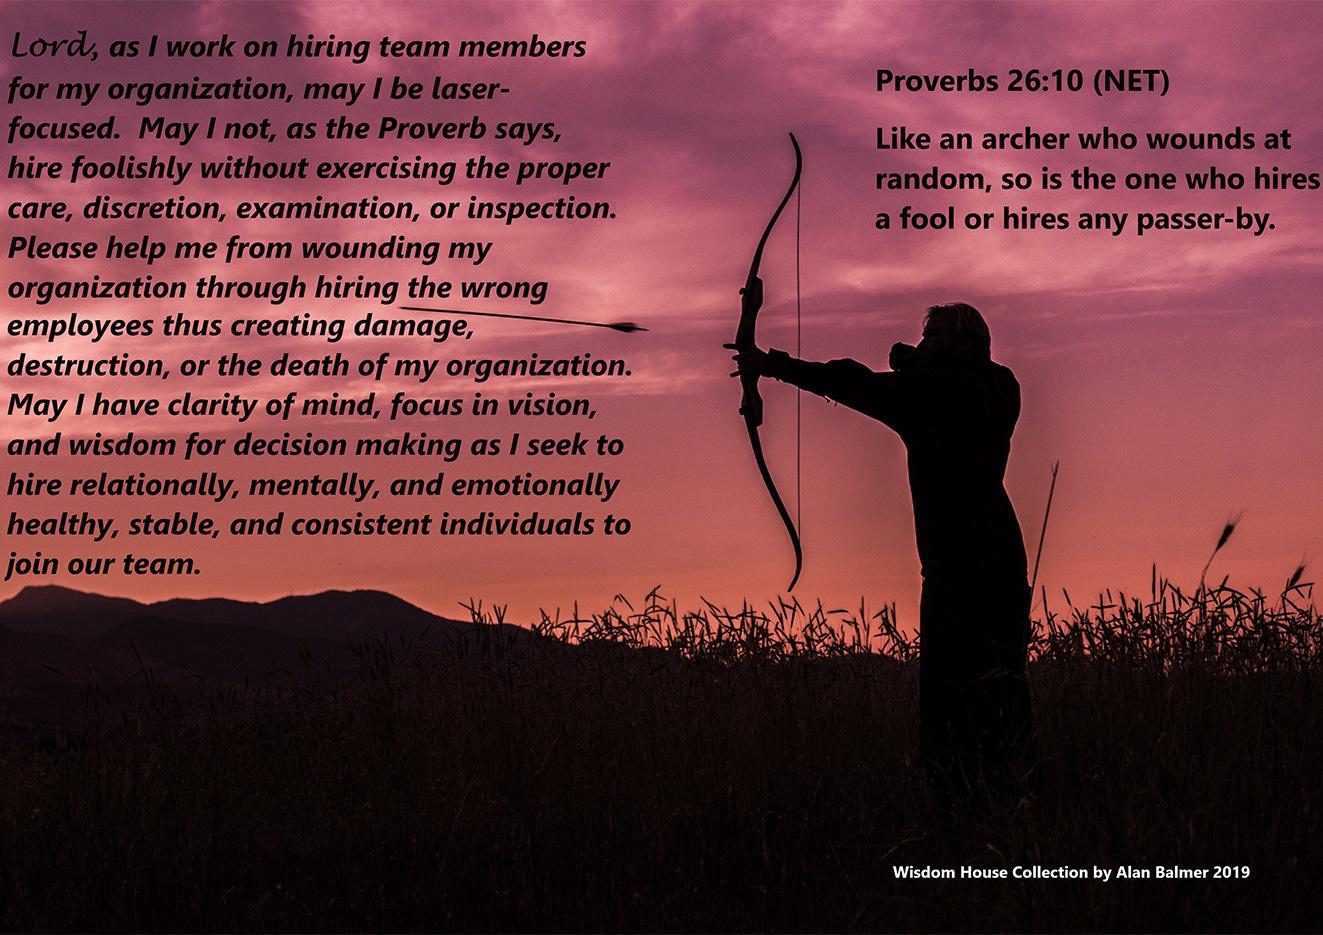 The Hiring Prayer Based on Proverbs 26:10 -